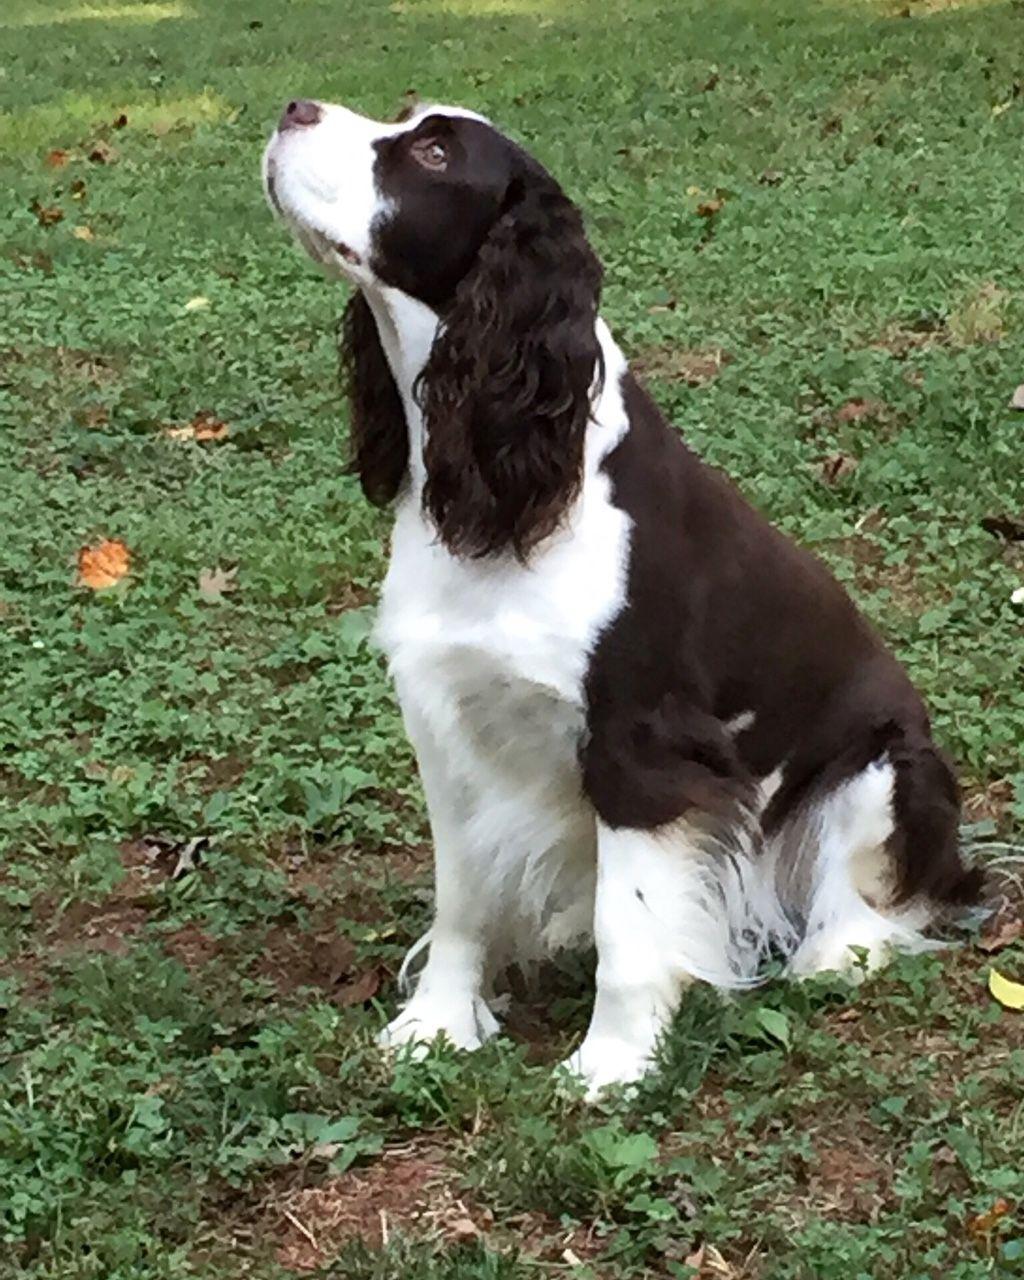 Mossmoon Moon Hunting Dogs Breeds Cocker Spaniel Dog